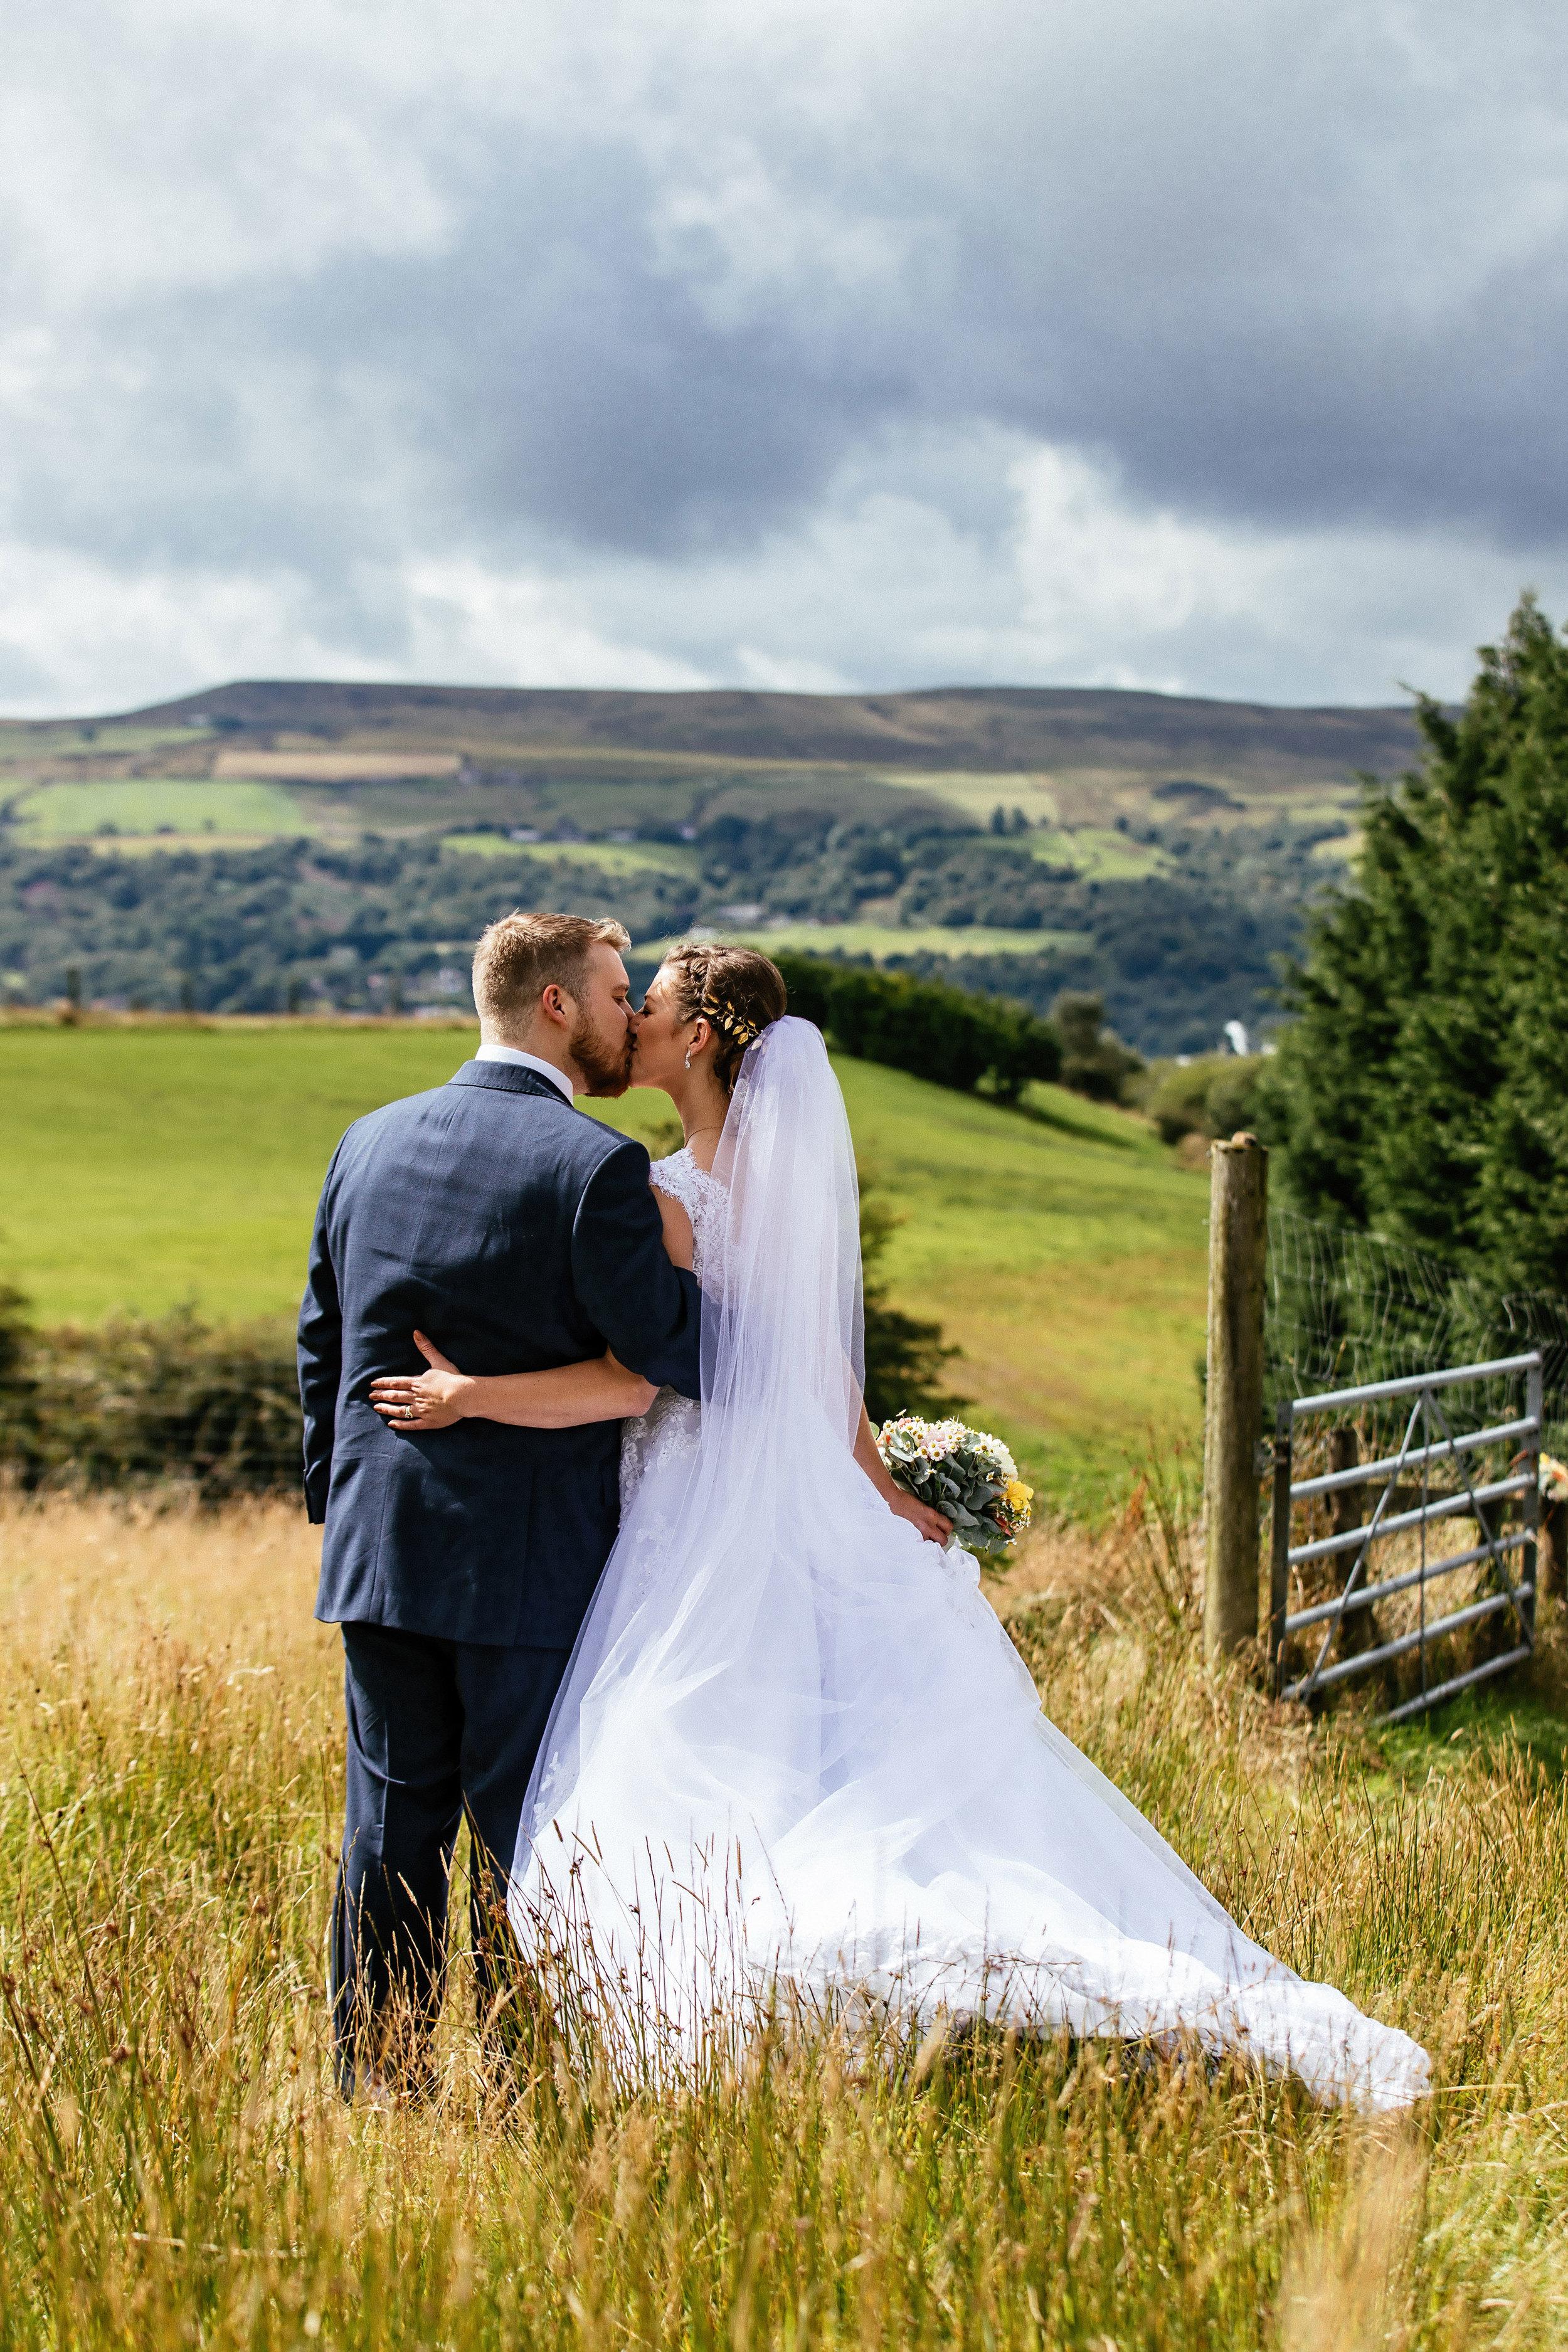 Kathryn-and-Mike-Wedding-Highlights-67.jpg